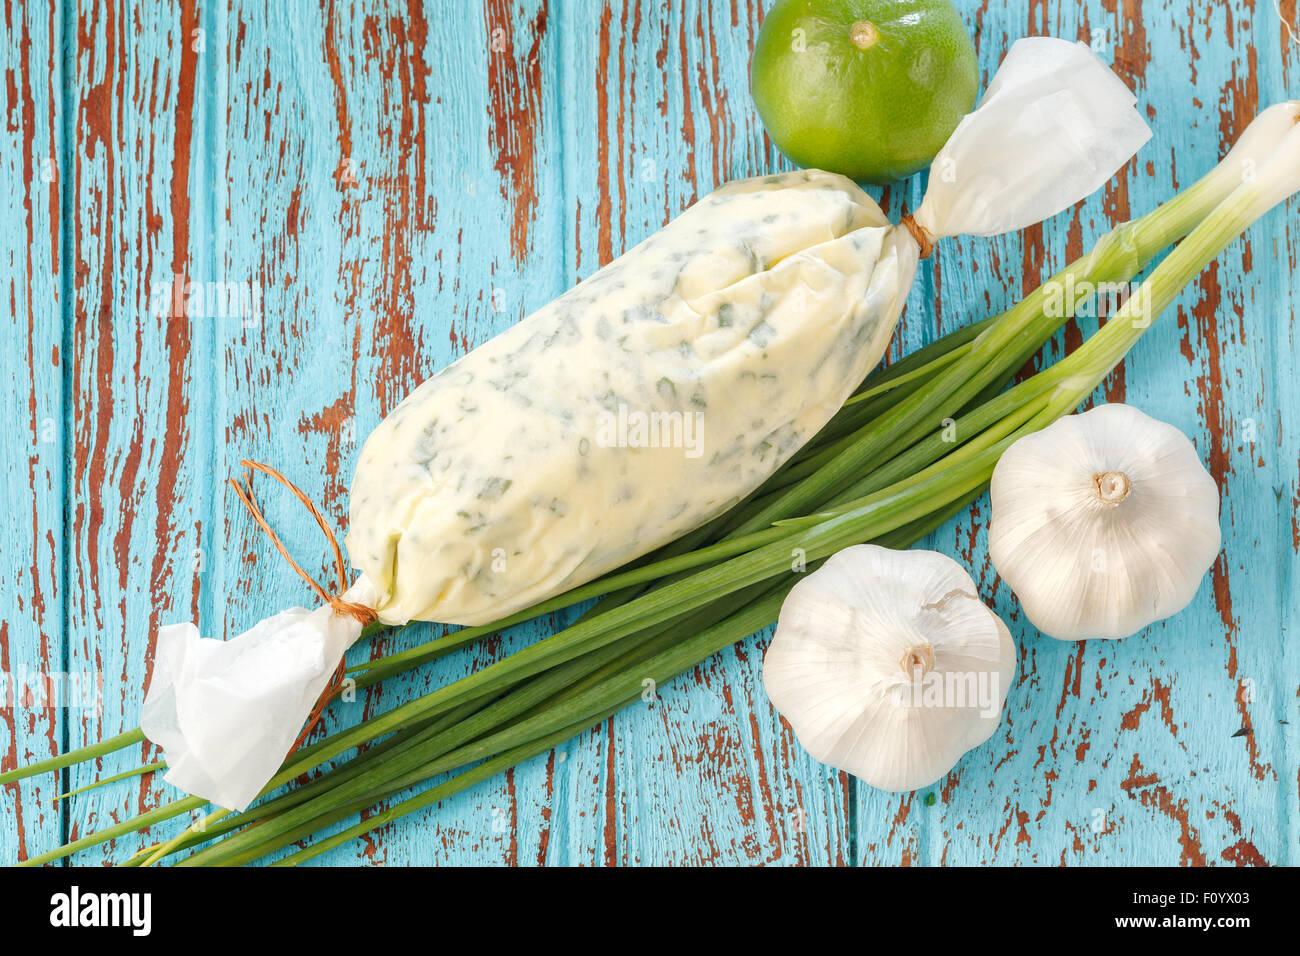 compound butter ingredients herb coriander garlic lemon fresh green onion homemade italian food tasty - Stock Image